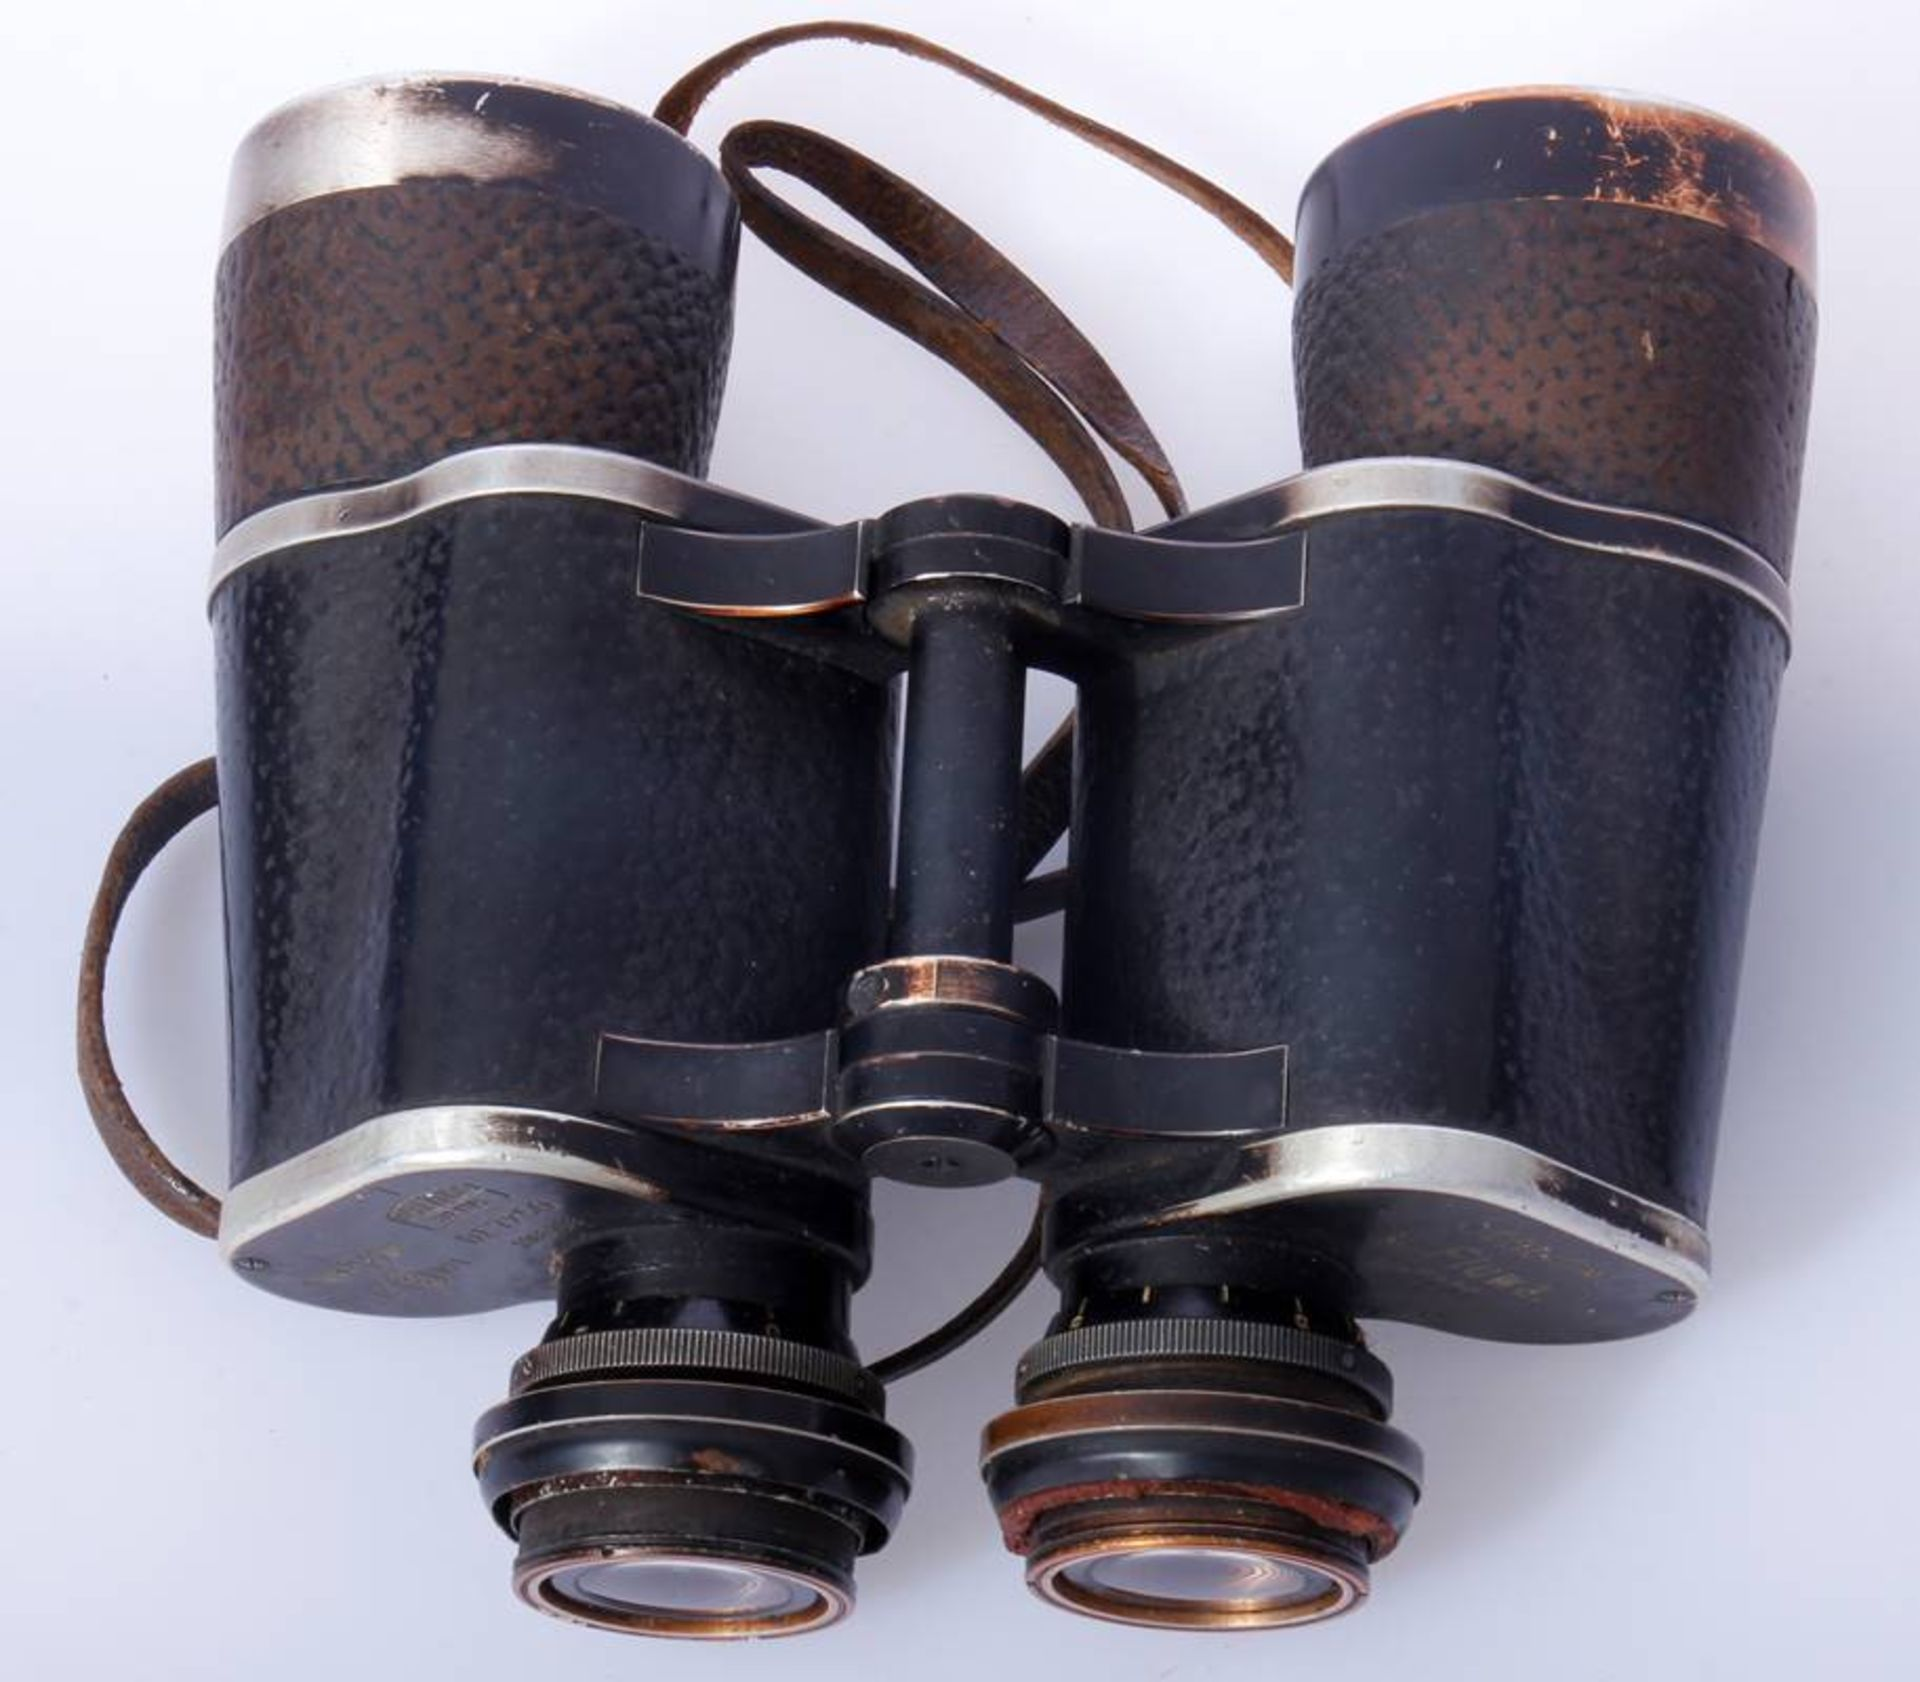 Marinefernglas DE 7 x 50Schwarzes Marinefernglas 7 x 50 DE Karl Zeiss Jena mit Abnahmestempel, - Bild 4 aus 7